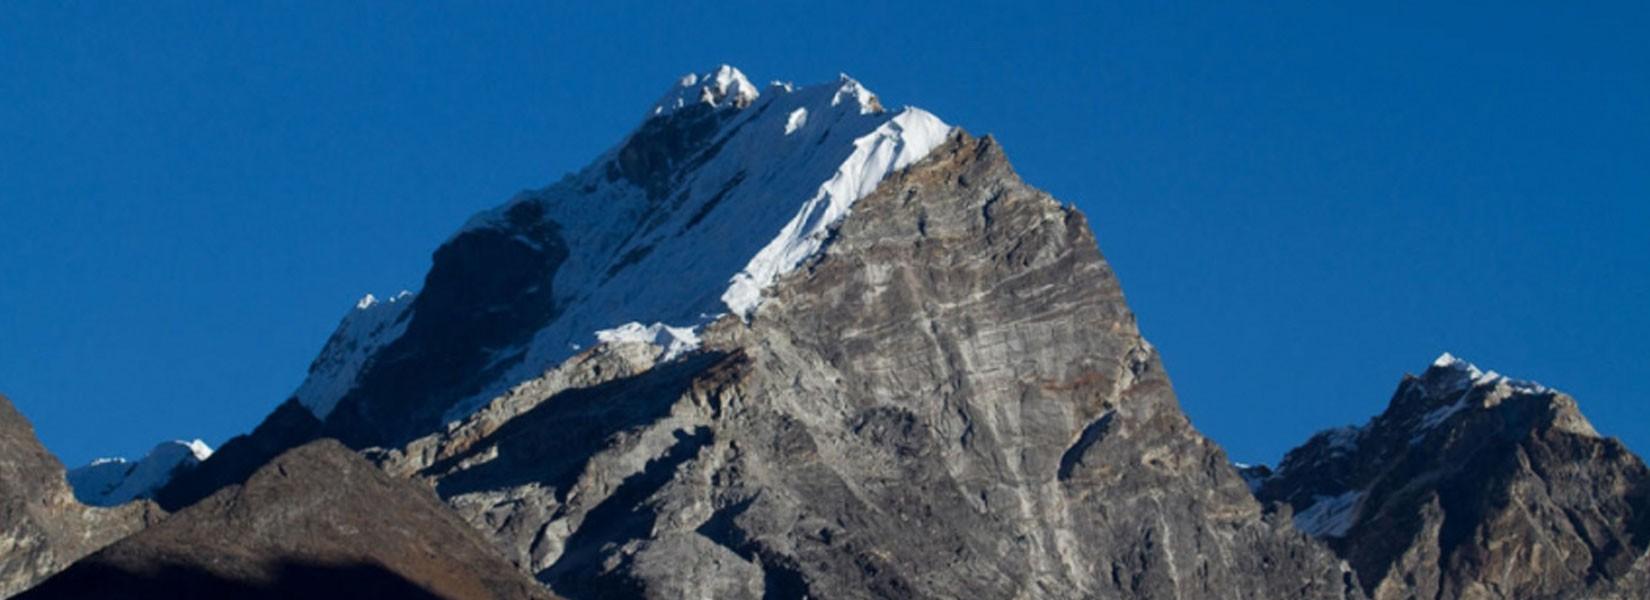 Lobuche East Peak Climb